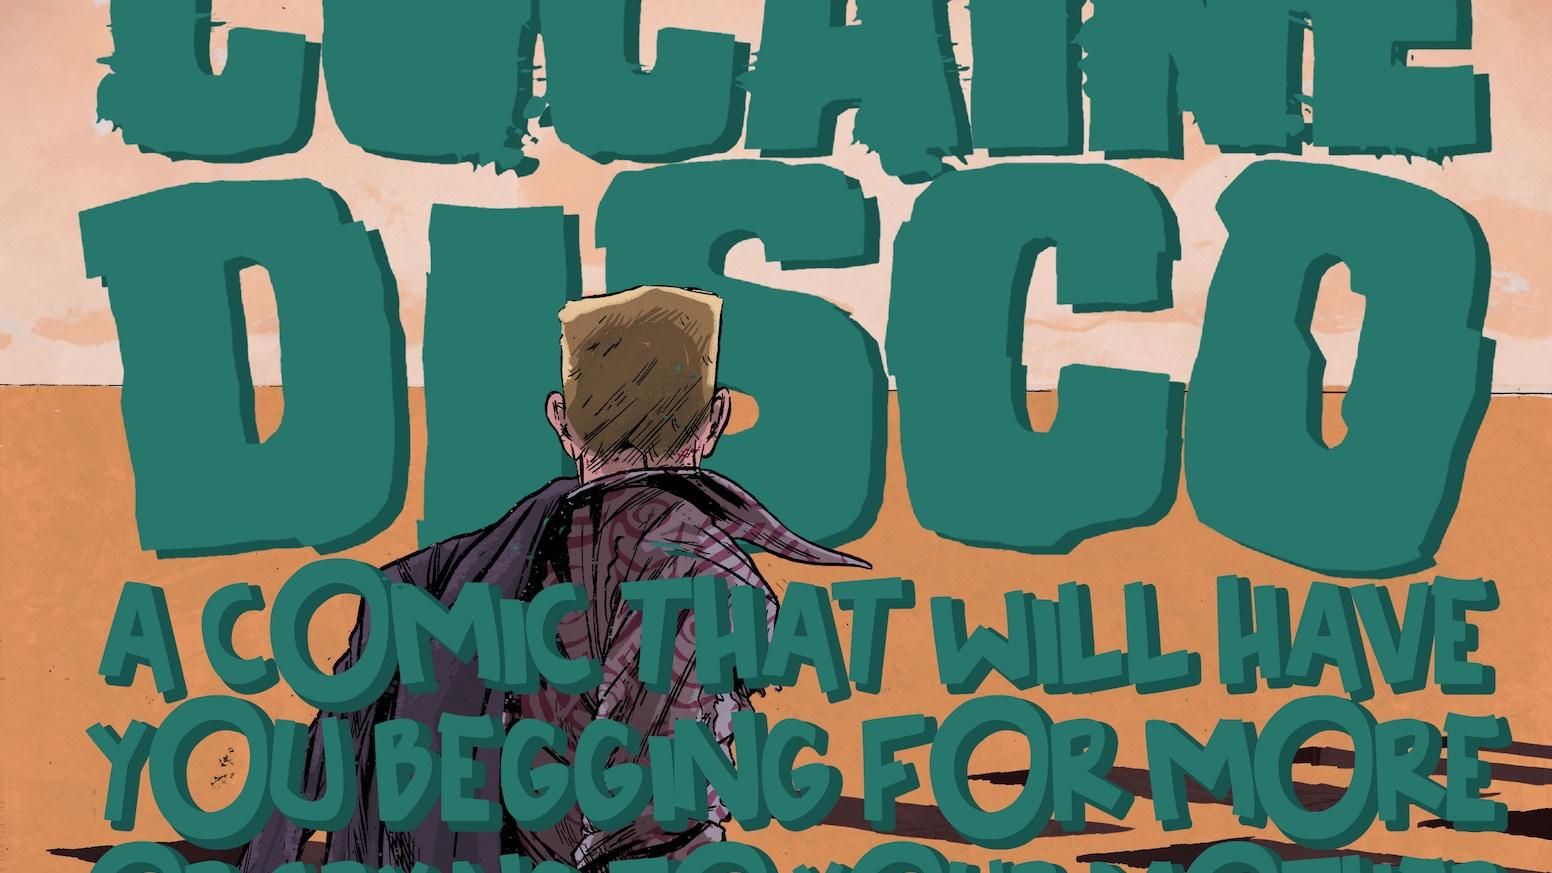 Cocaine Disco 1 By Spencer Desmond Kickstarter Tendencies Tshirt Legend Led Turquoise M